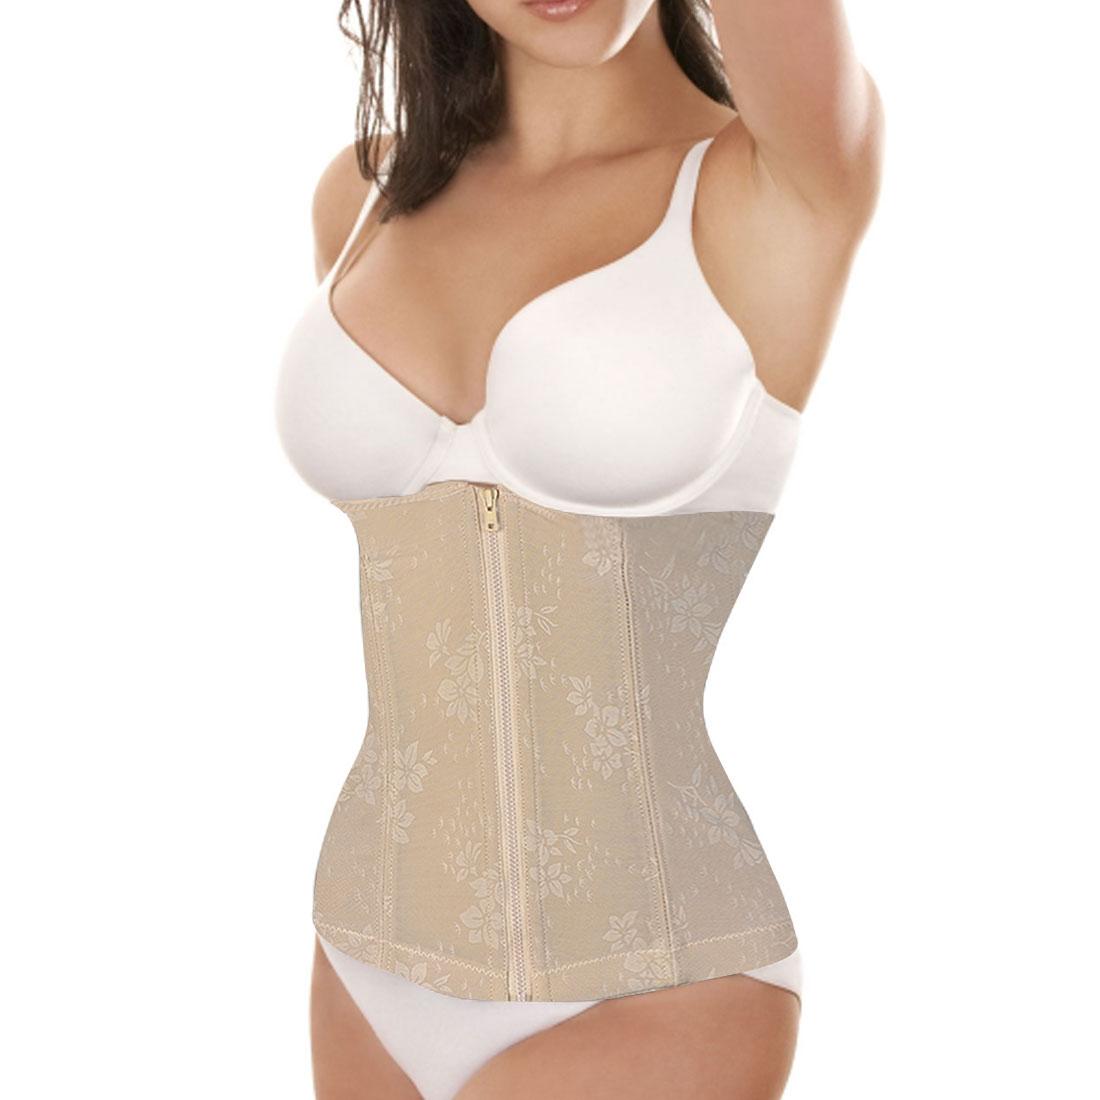 Ladies Stretch Shapewear Slimming Belt Zip Front Corset Waist Cincher Beige M